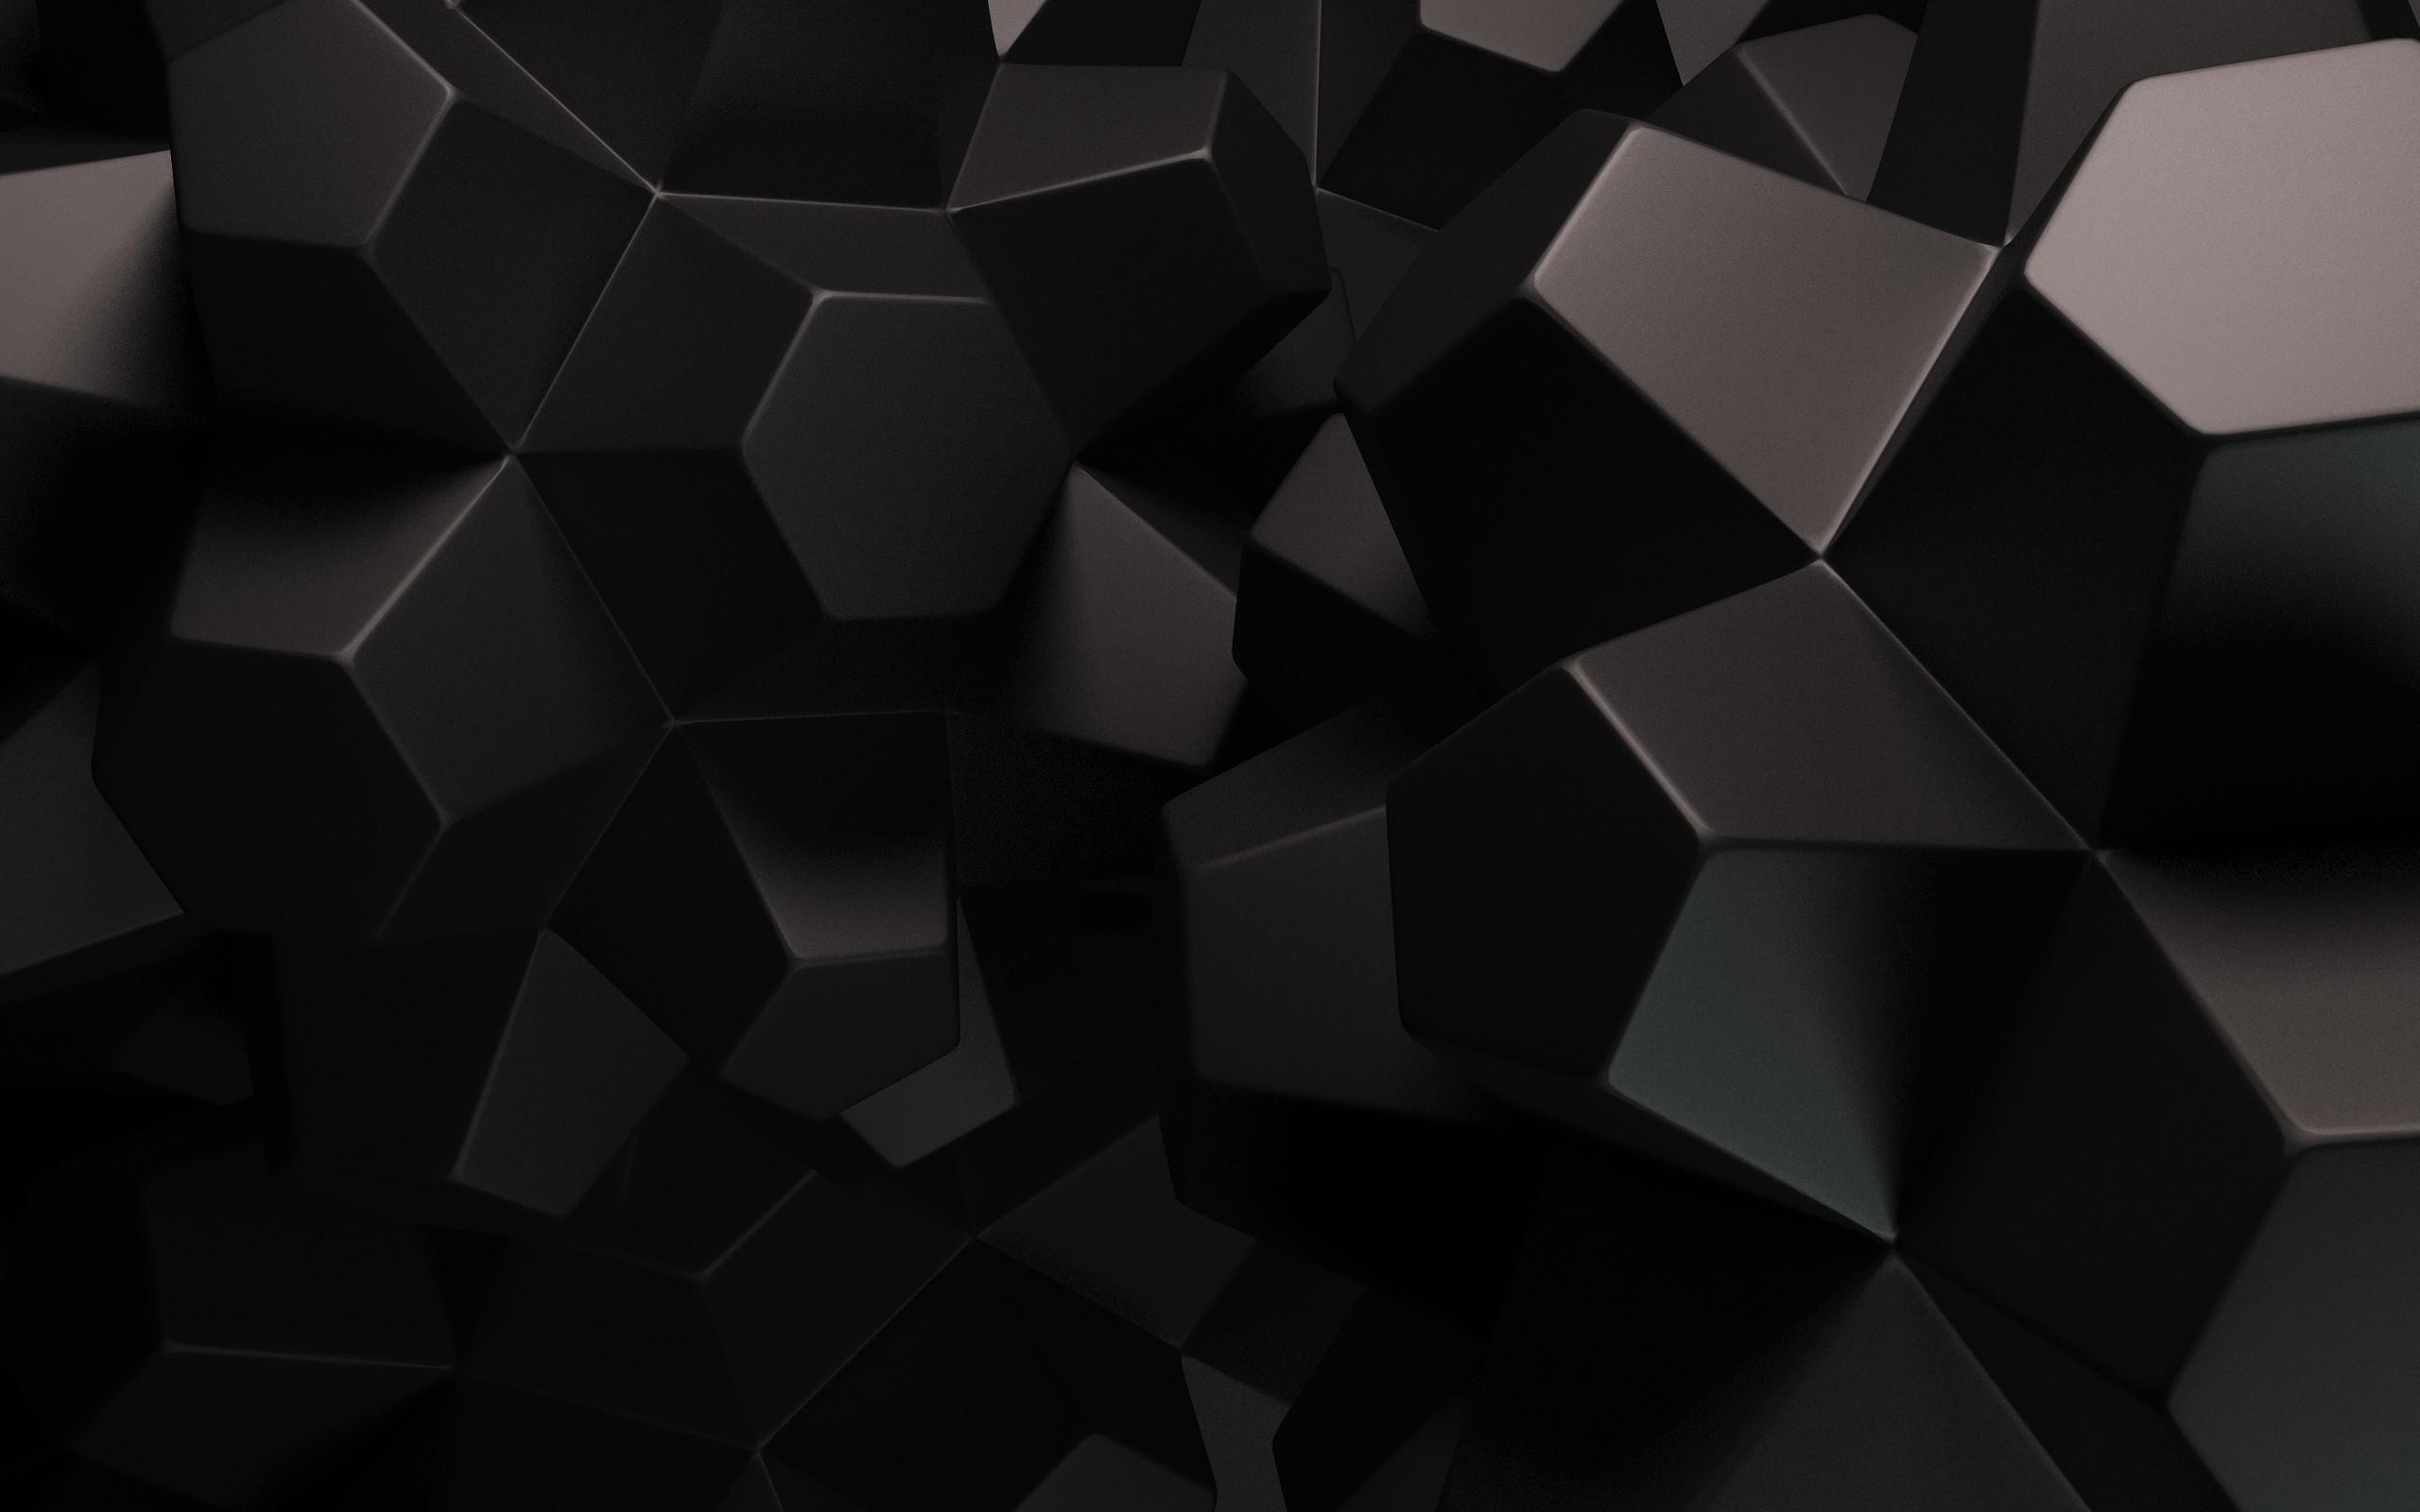 … Black Desktop Wallpaper …